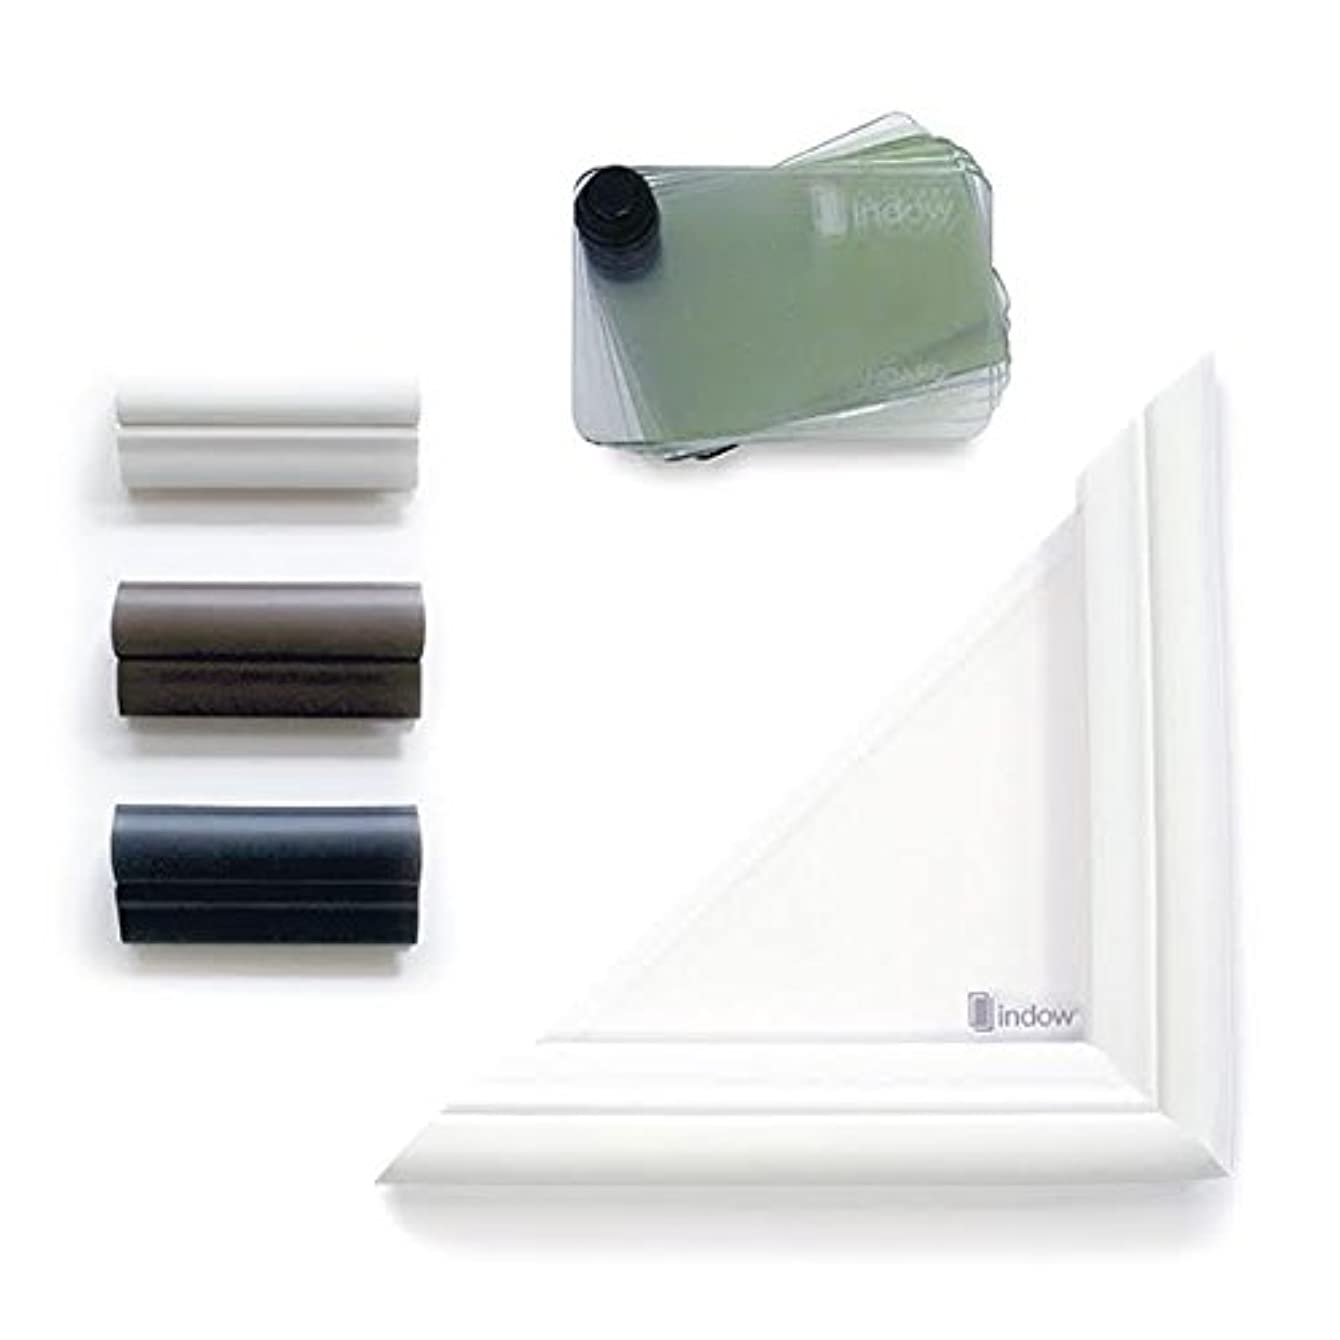 Indow Window Inserts - Sample Kit